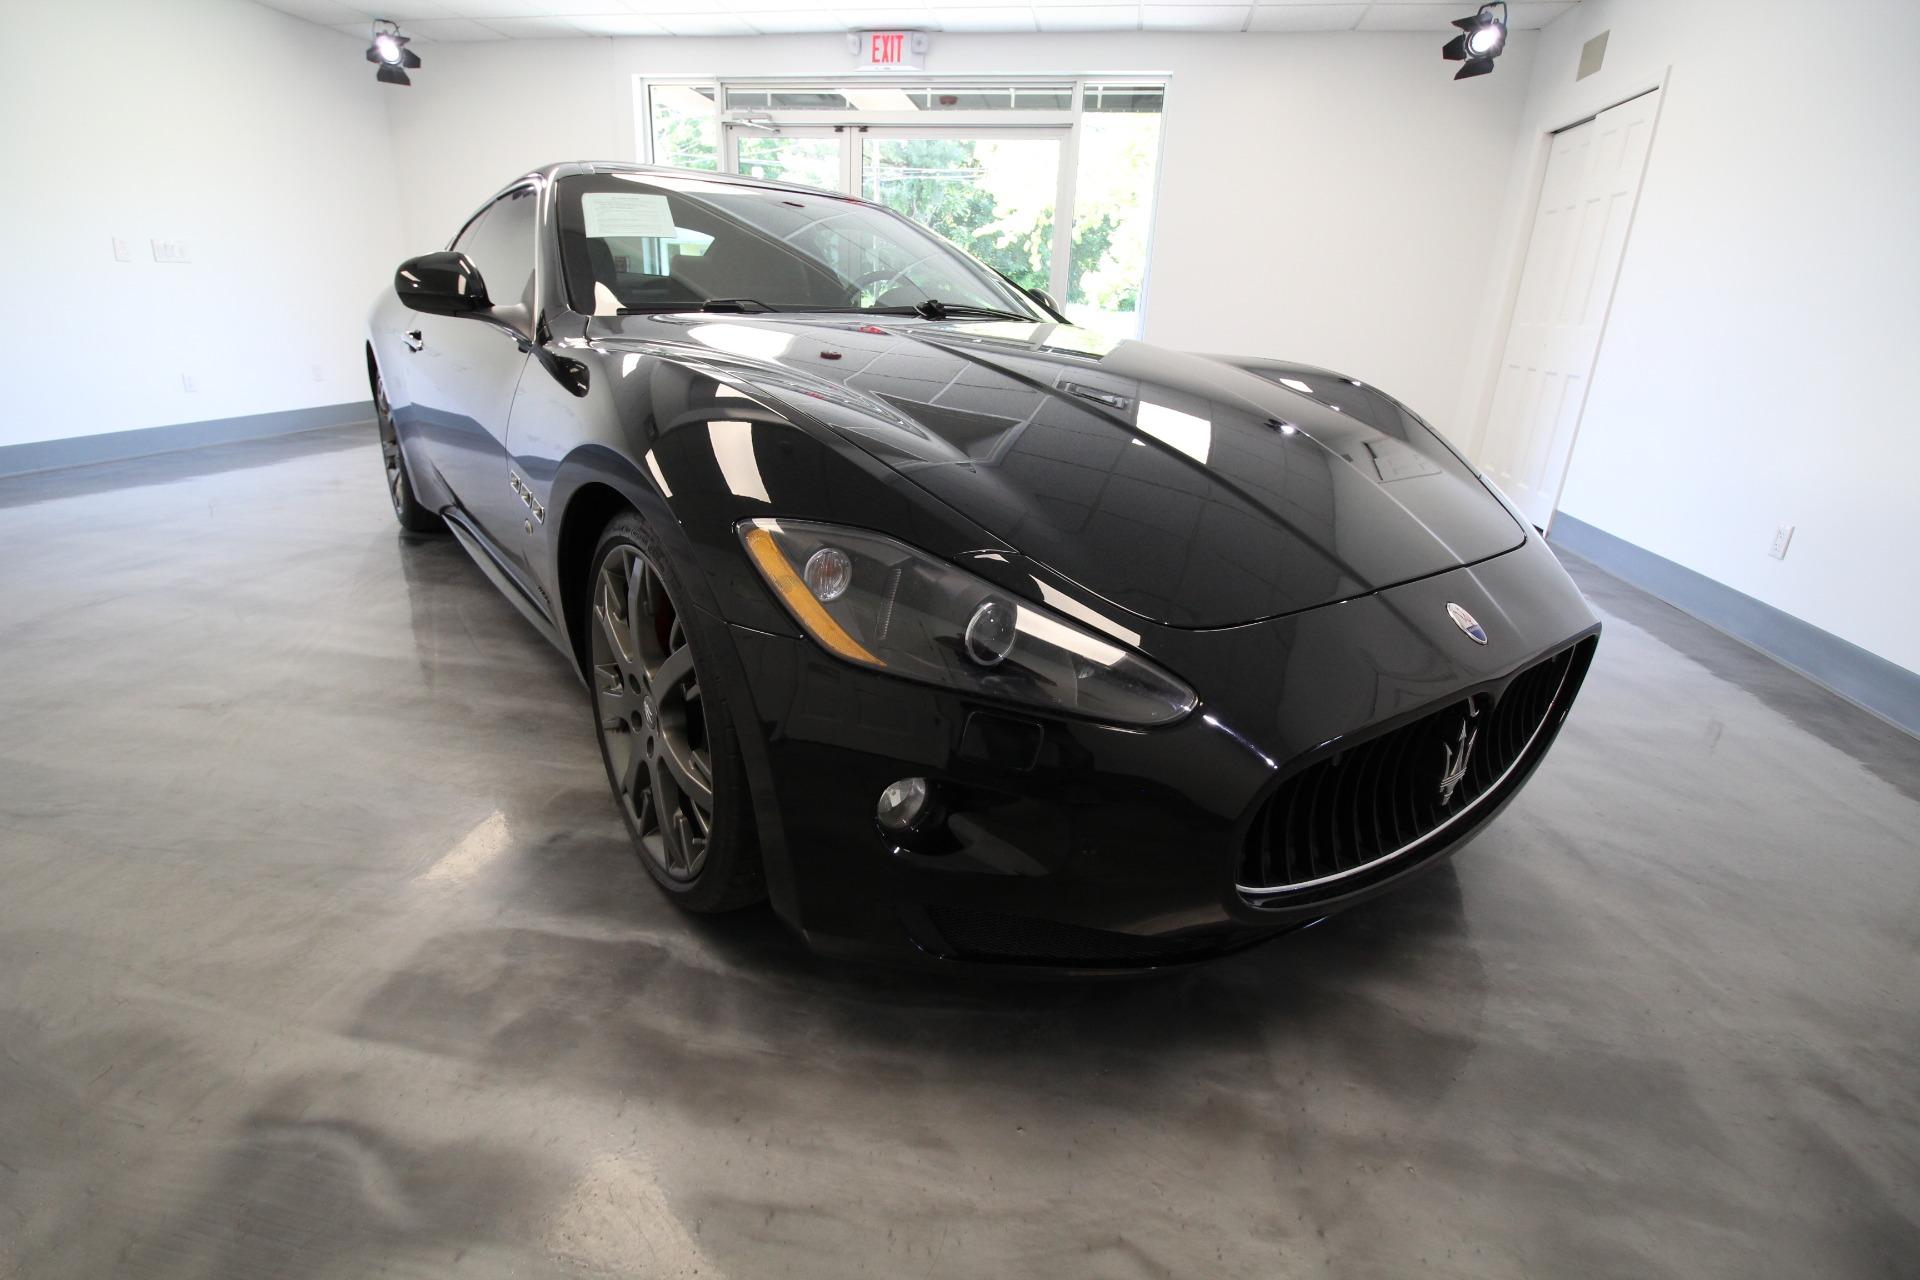 Used 2009 Maserati GranTurismo GTS CAMBIOCORSA 1 OWNER 1 OF 300 SUPER RARE F430 ENGINE 599 TRANSMISSION | Albany, NY